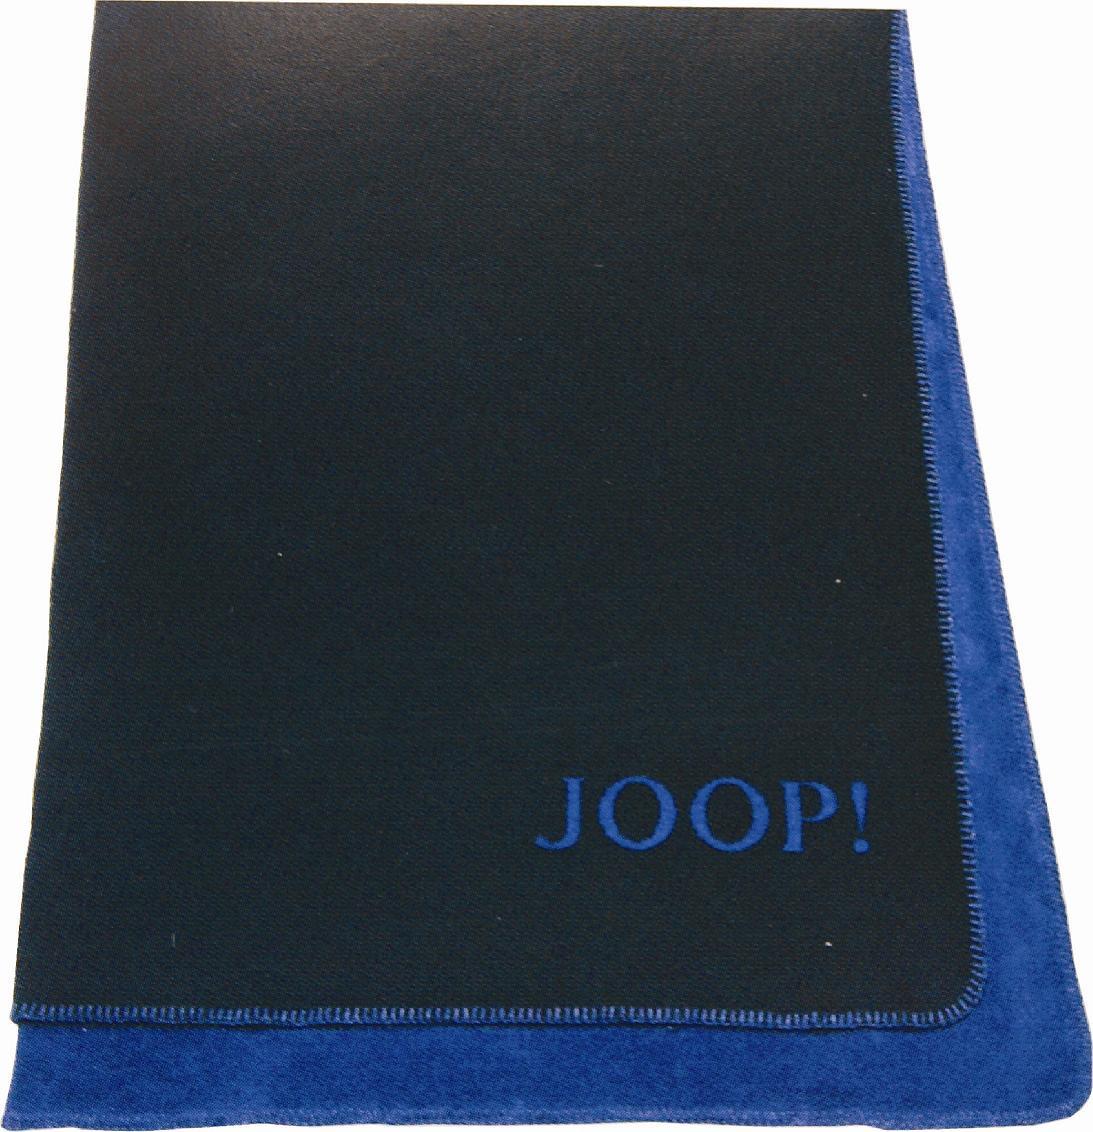 Joop Decke  JOOP Uni Doubleface Wohndecke Kuscheldecke Decke